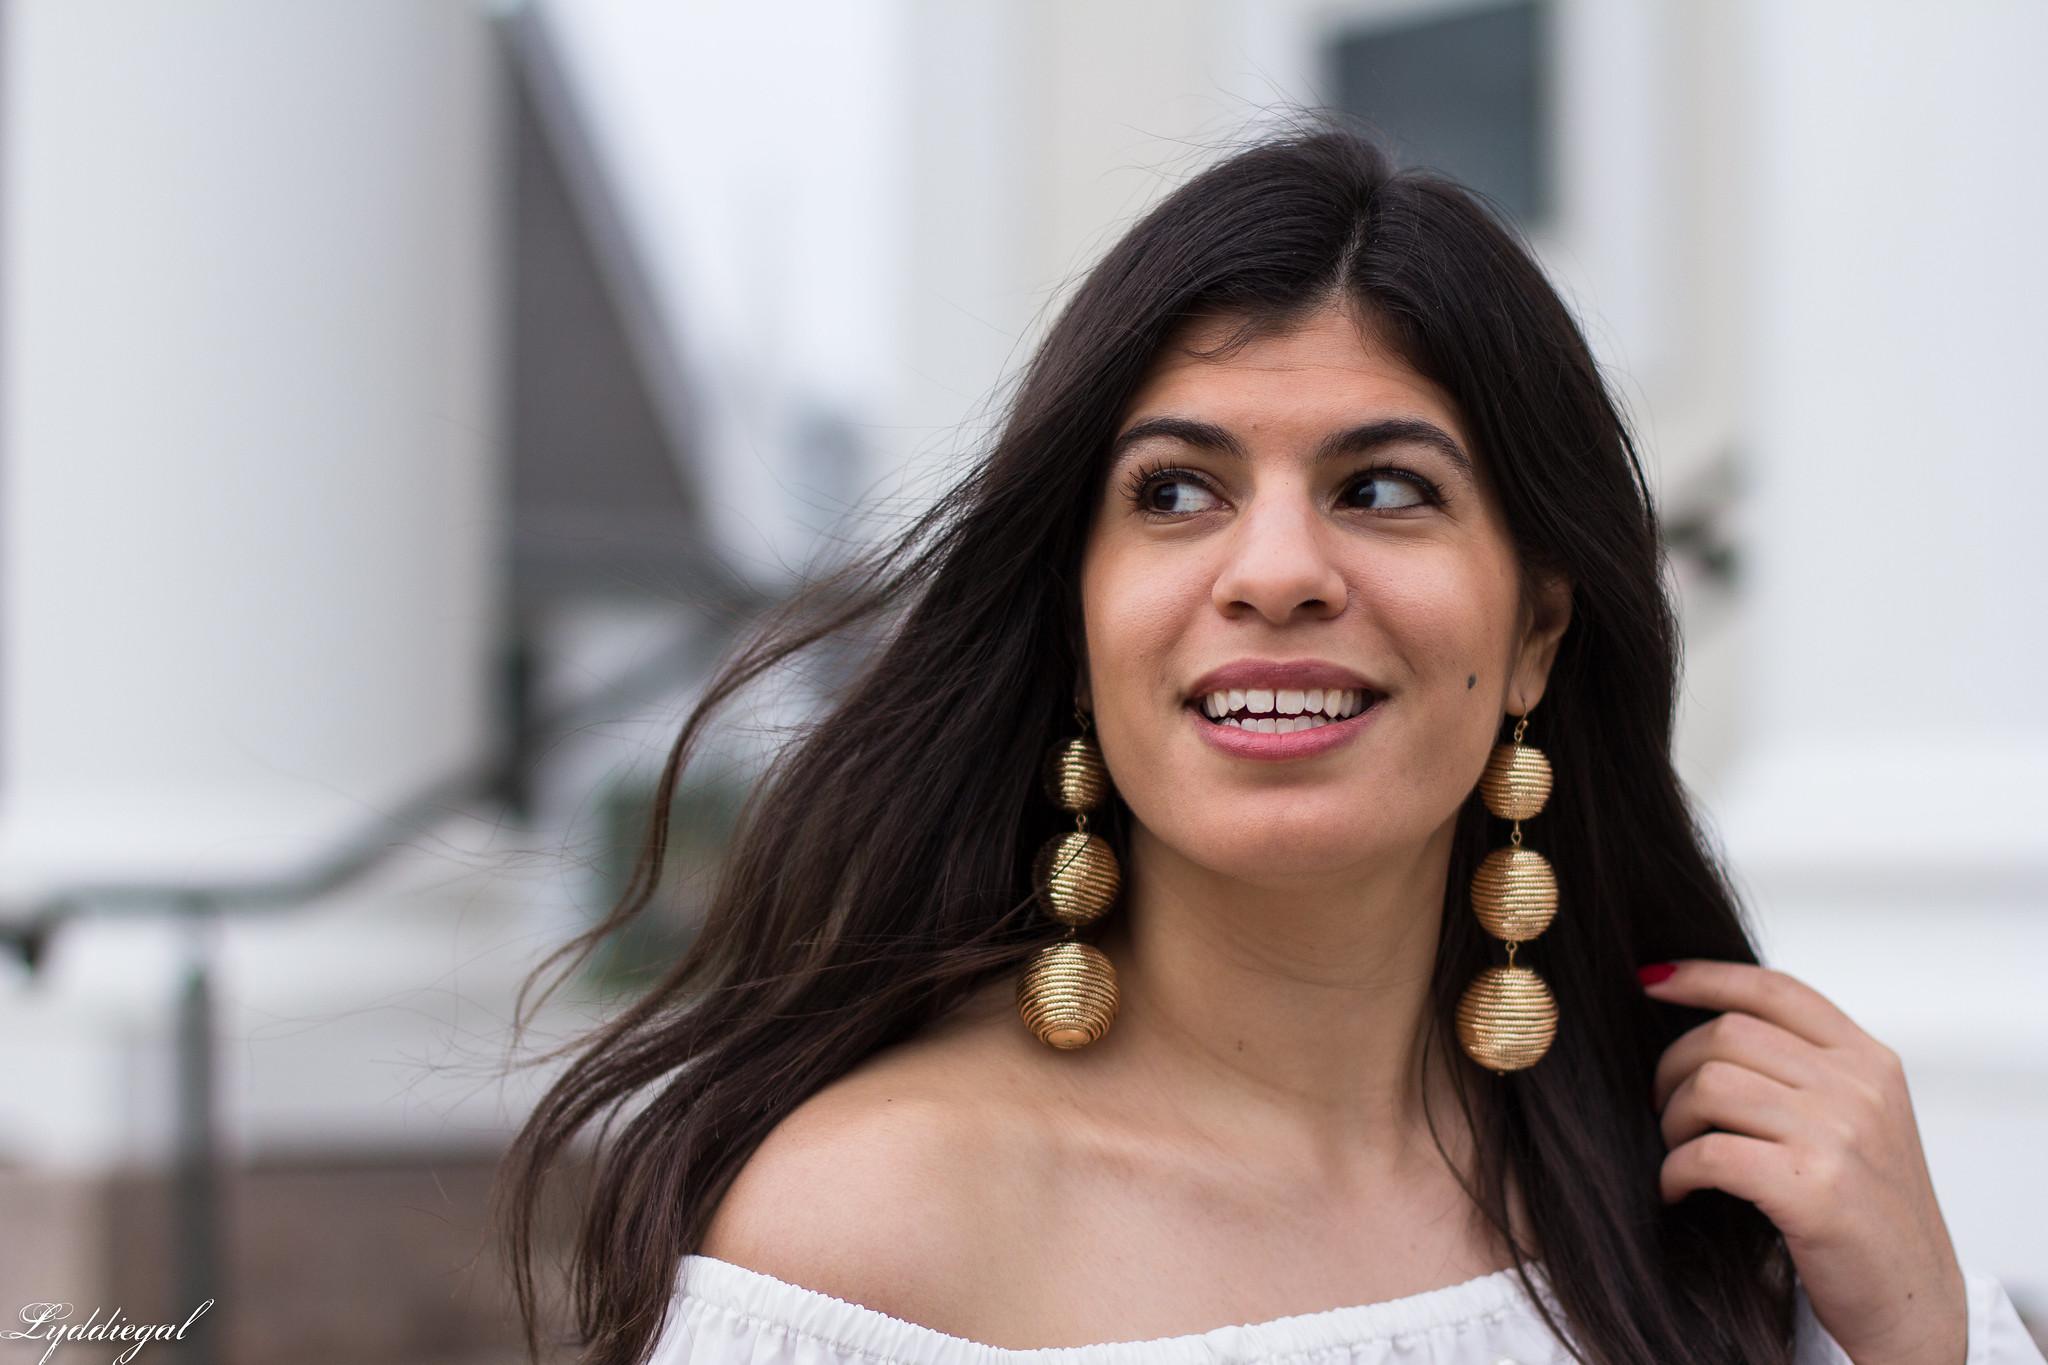 off the shoulder pearl embellished blouse, gold bon bon earrings13.jpg